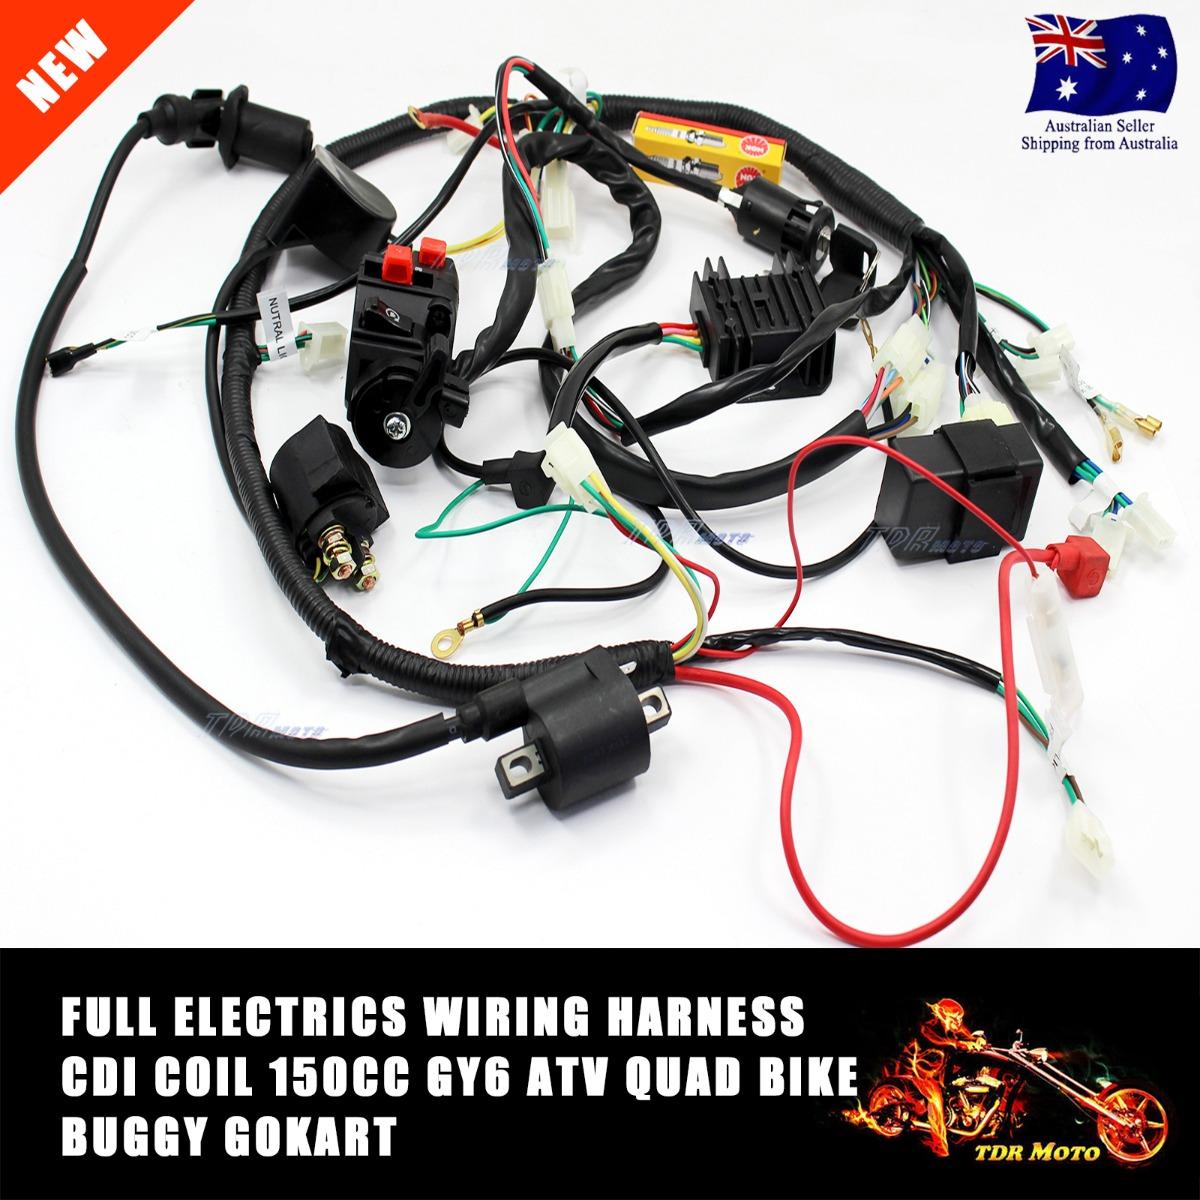 Backup camera wiring harness besides yamaha yzf 600 wiring diagram - Gy6 150cc Full Auto Cvt Clutch Engine Carburetor Wiring Loom Harness Set Ebay